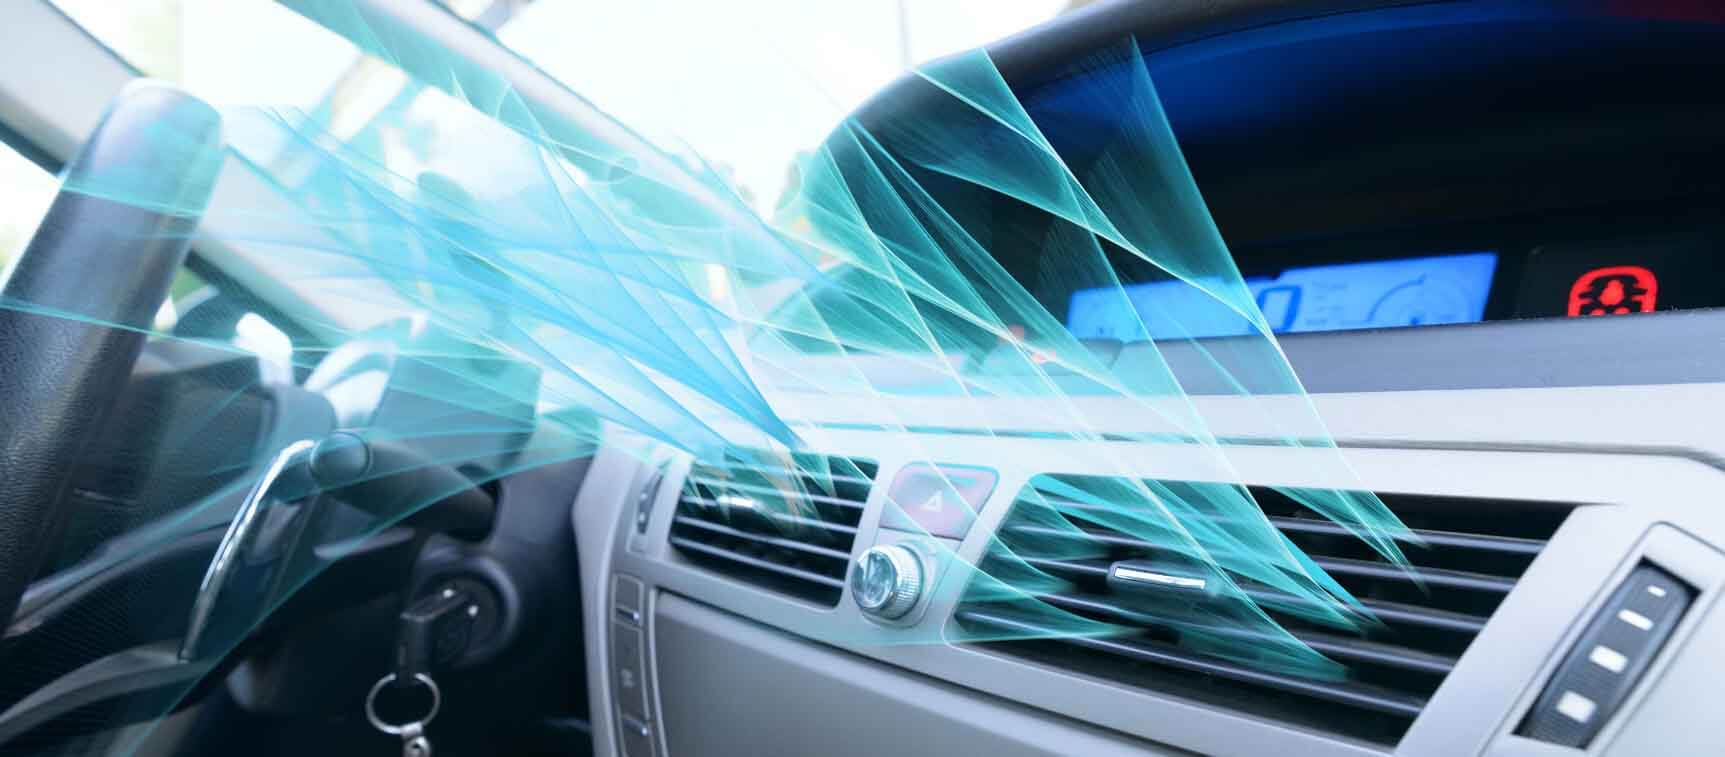 meilleur nettoyant ventilation climatisation voiture